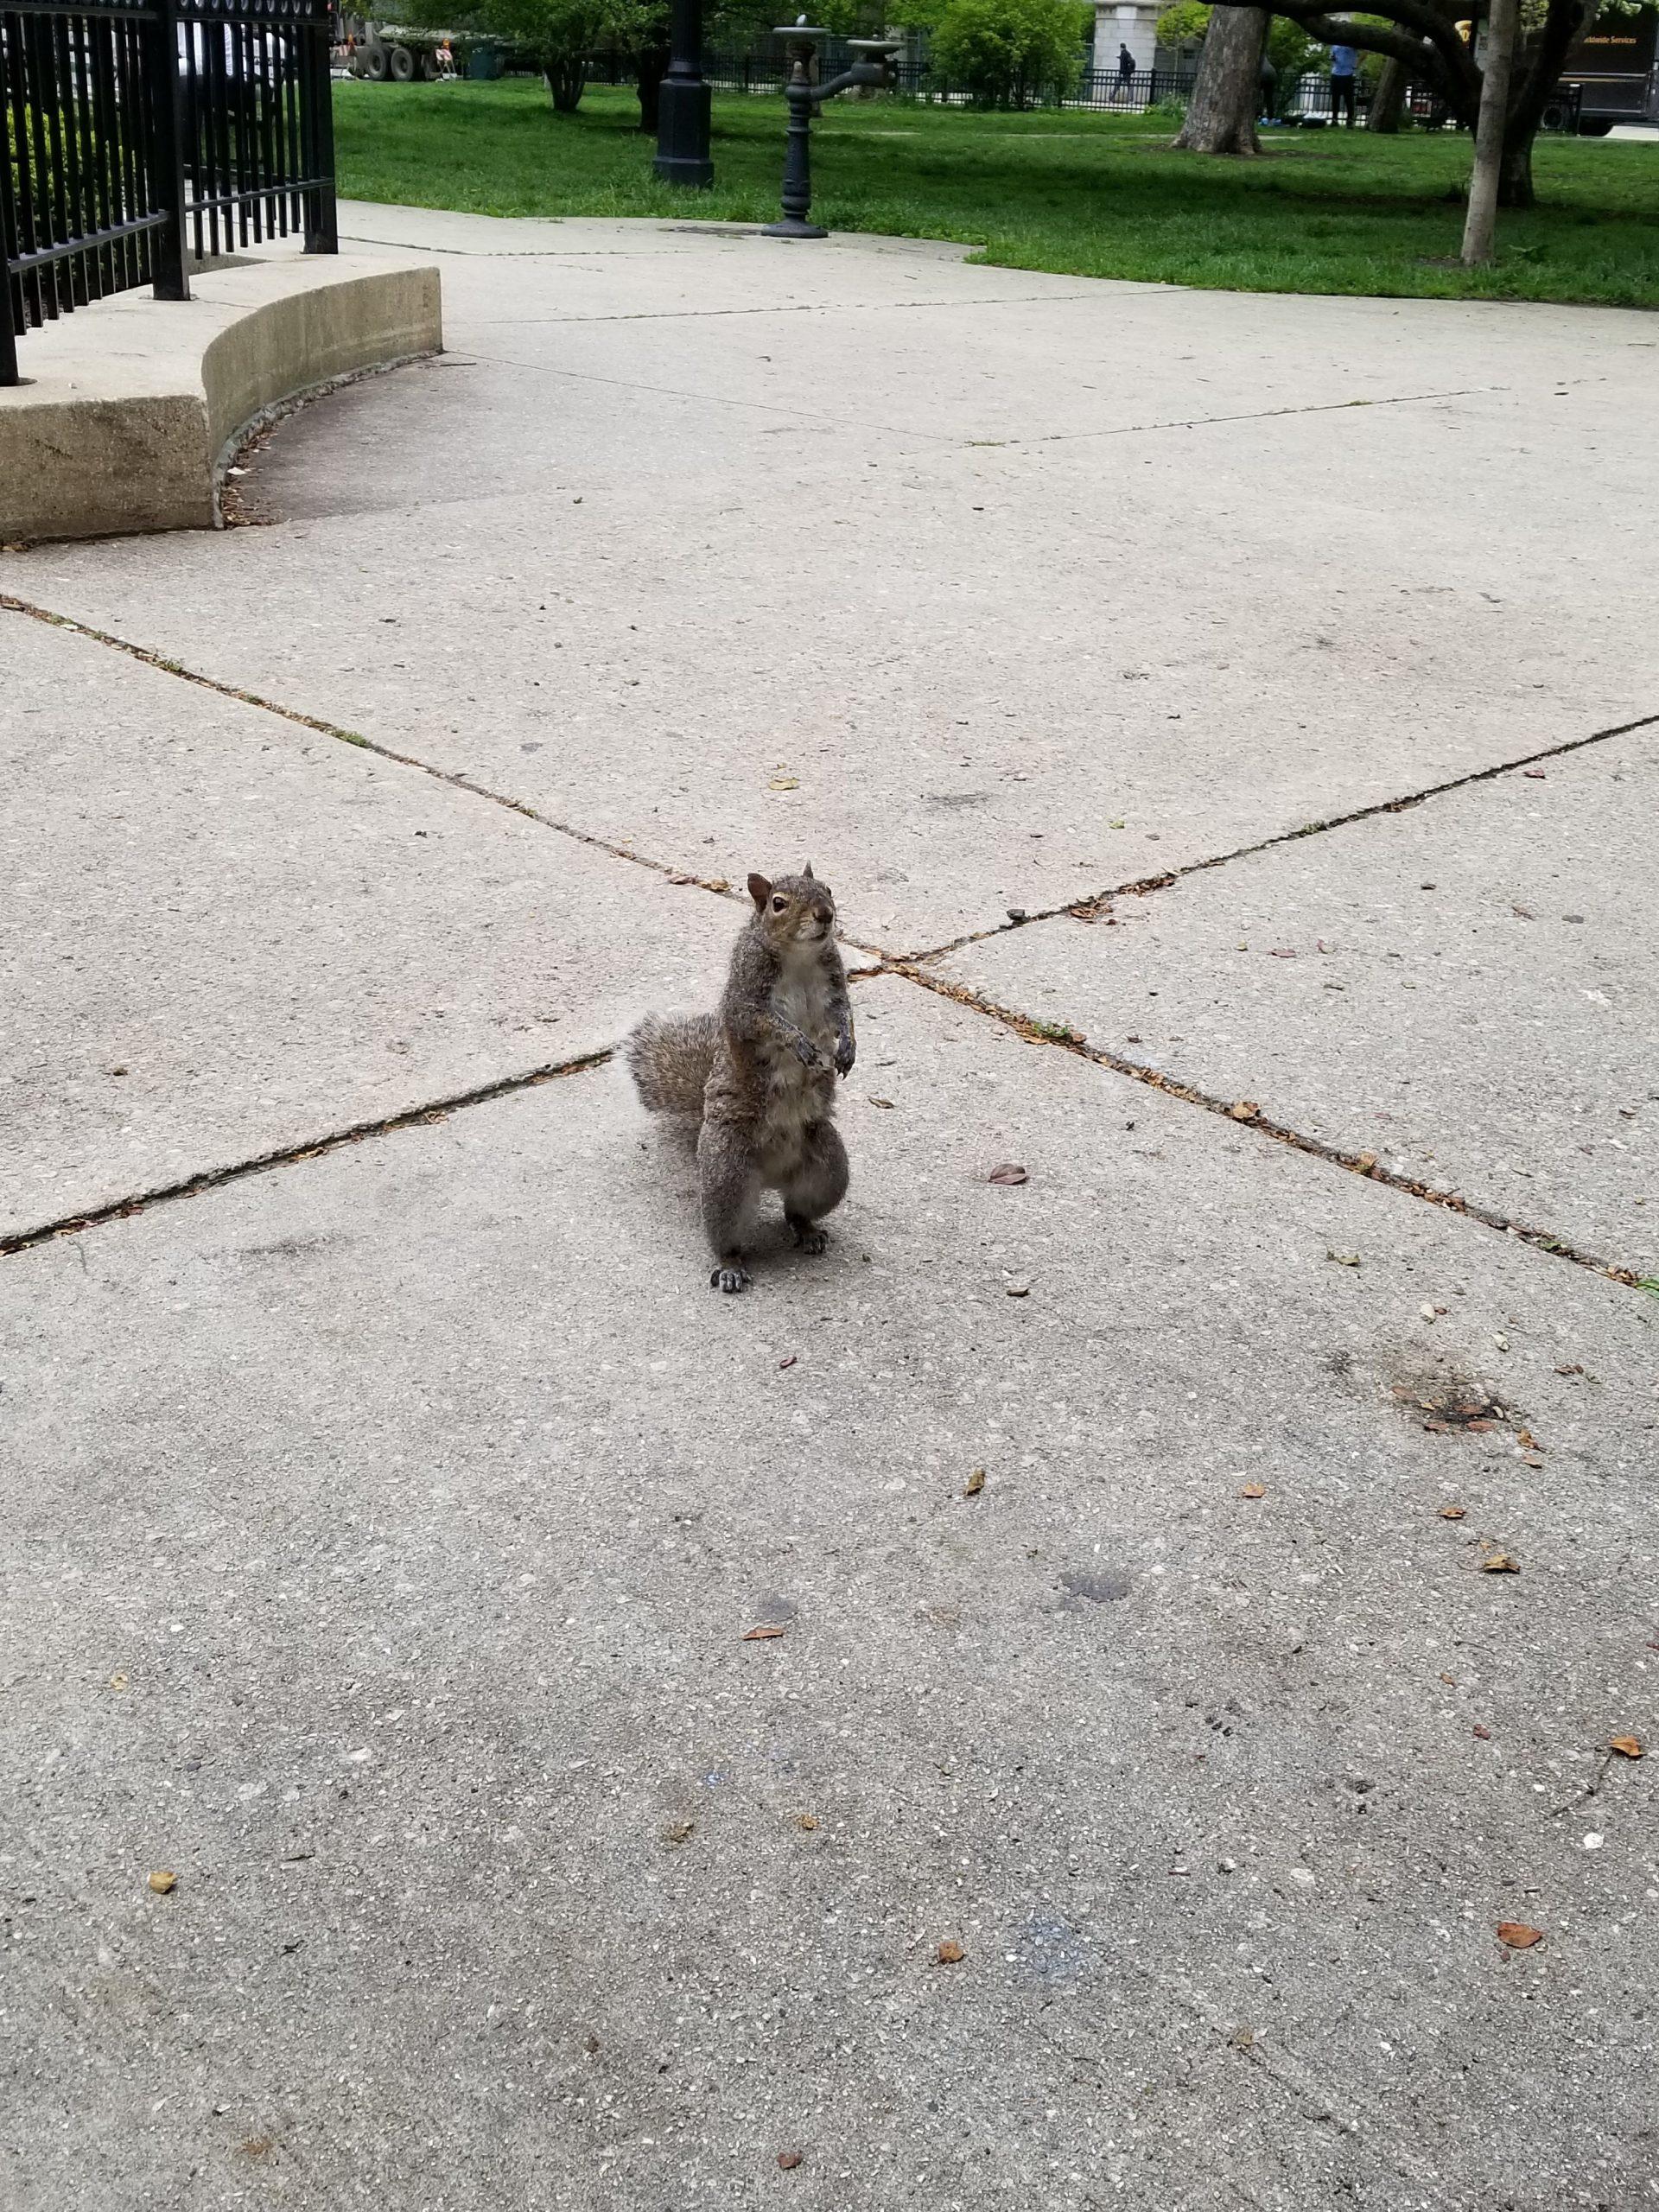 A not-quite-squirrelly squirrel